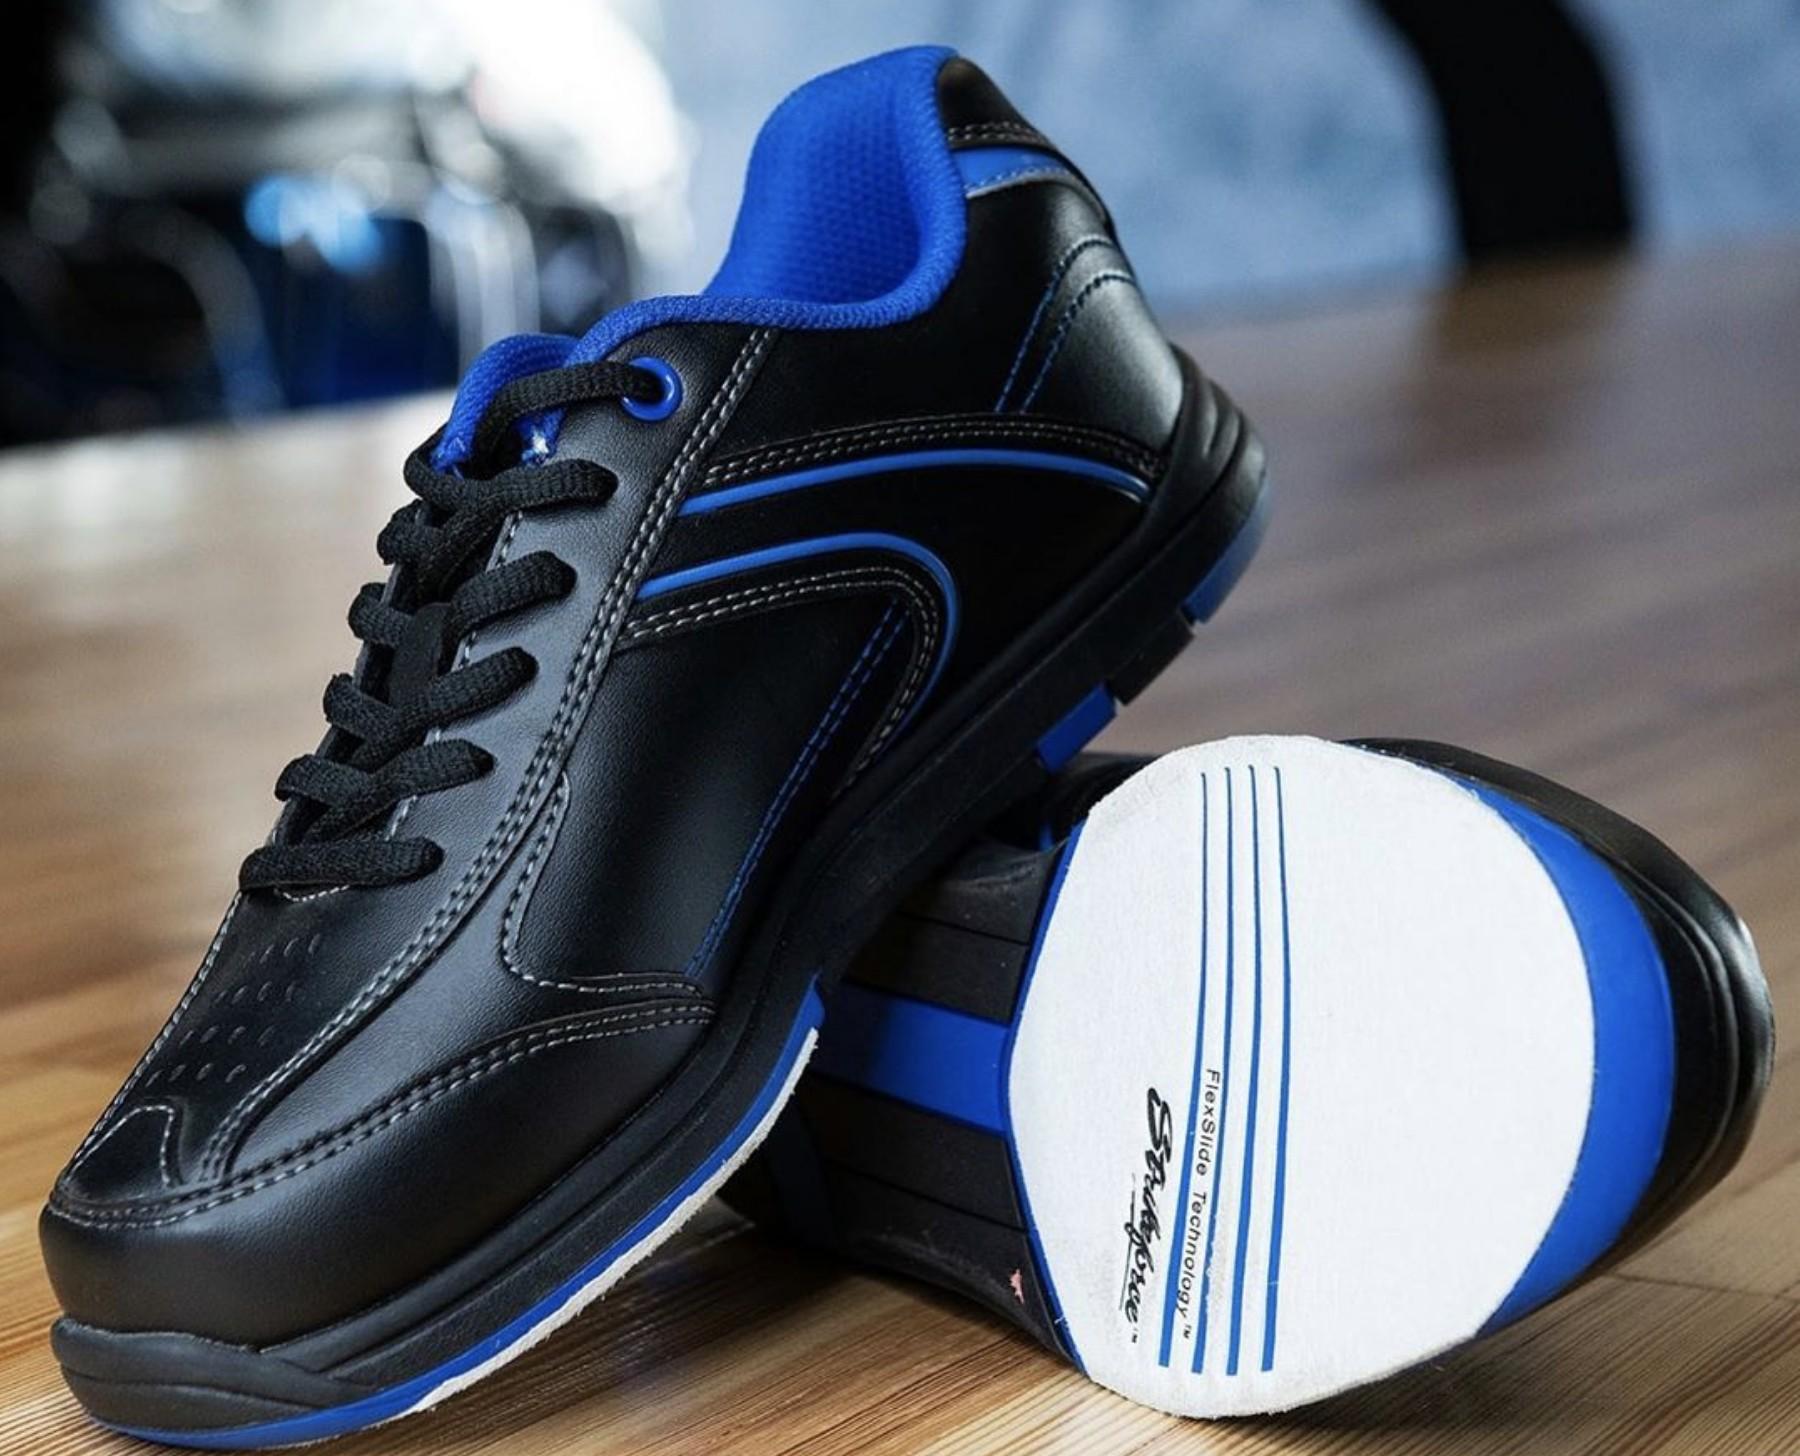 85b67e298d462 Jinjiang gets on the map as China's sports shoe capital as Anta ...